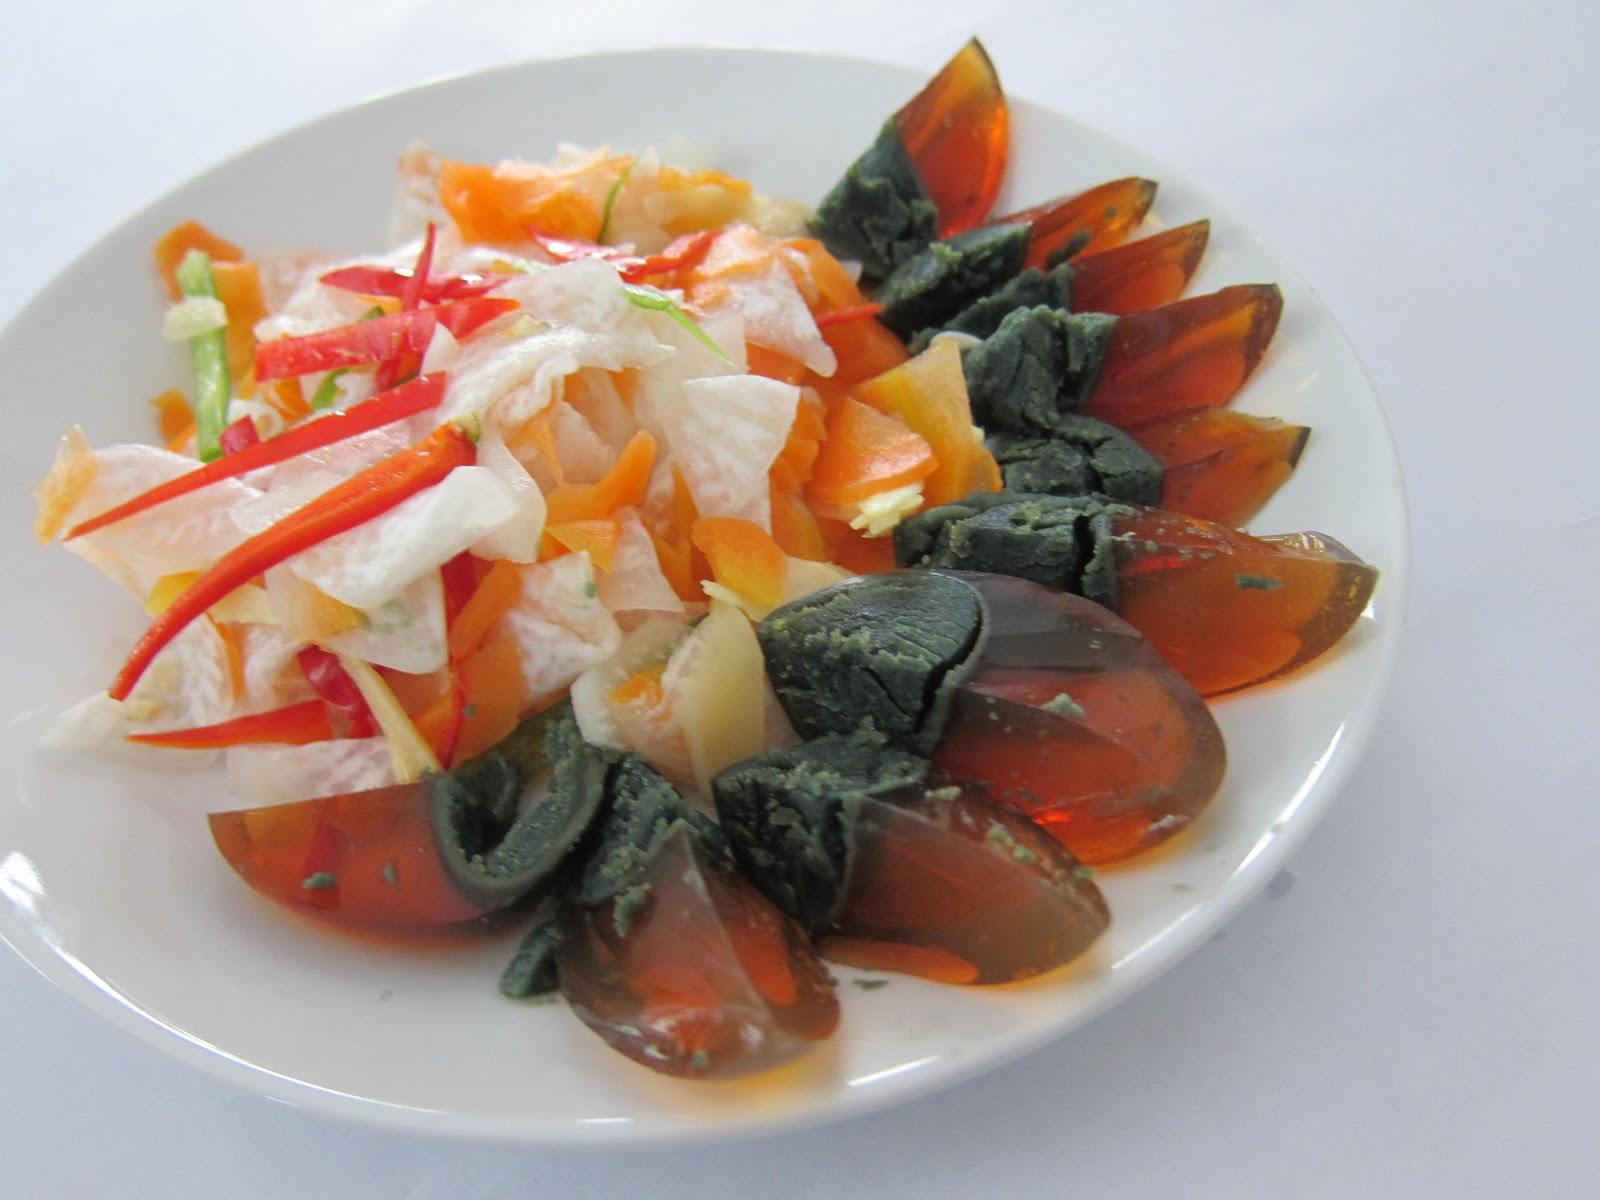 Janet wooi s blog jw chinese new year recipe pickled radish and jw chinese new year recipe pickled radish and ginger with century egg forumfinder Images